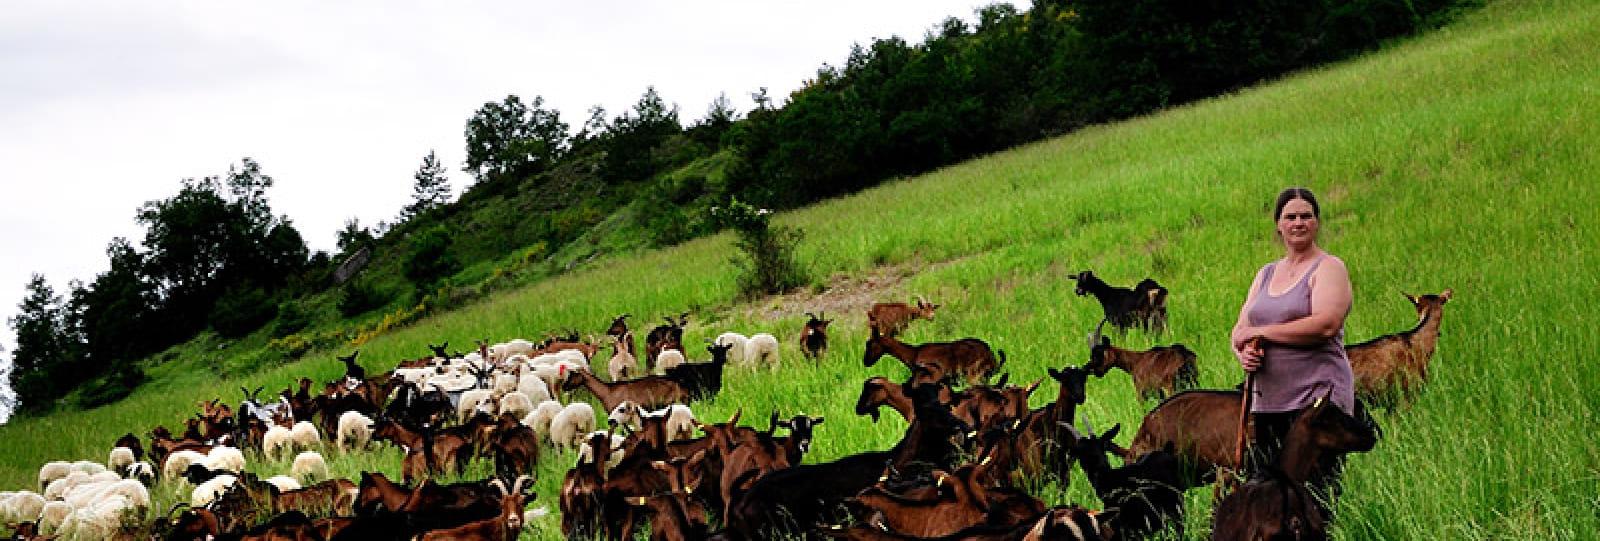 Ferme du Villard (farm)